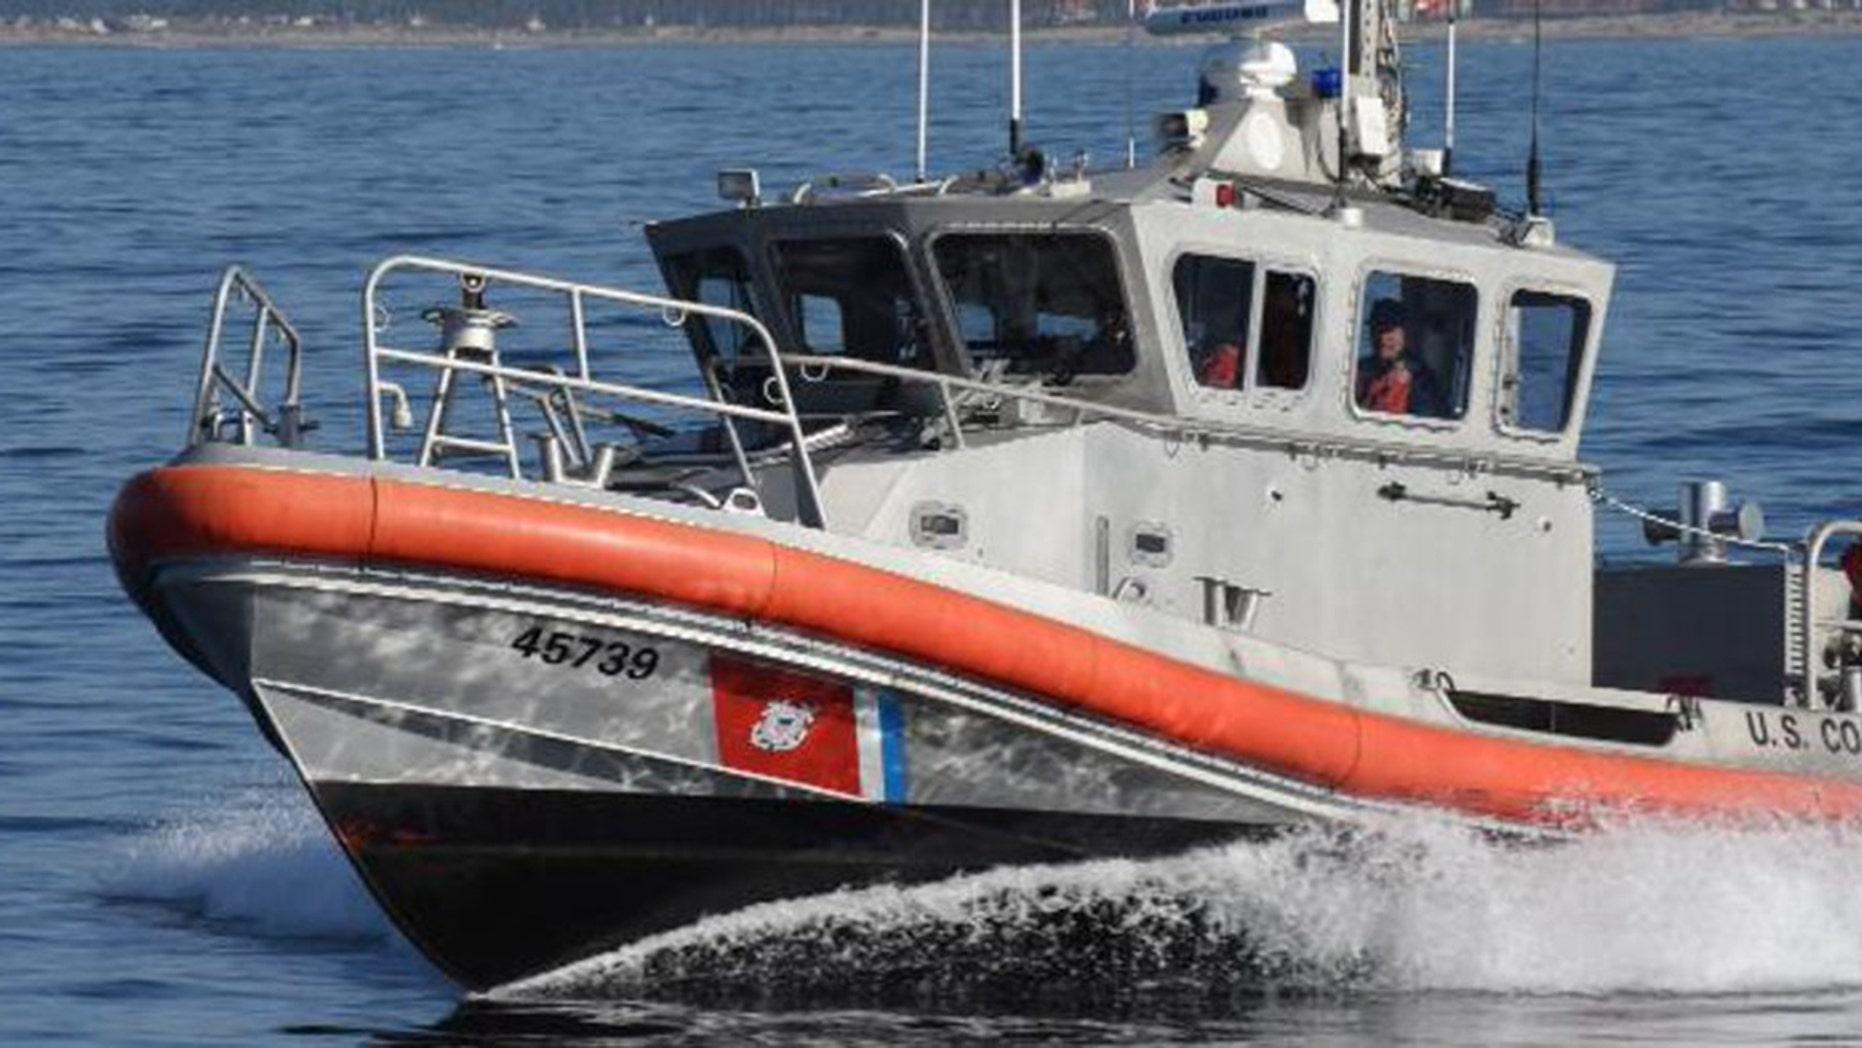 Dozens reportedly killed in California boat fire